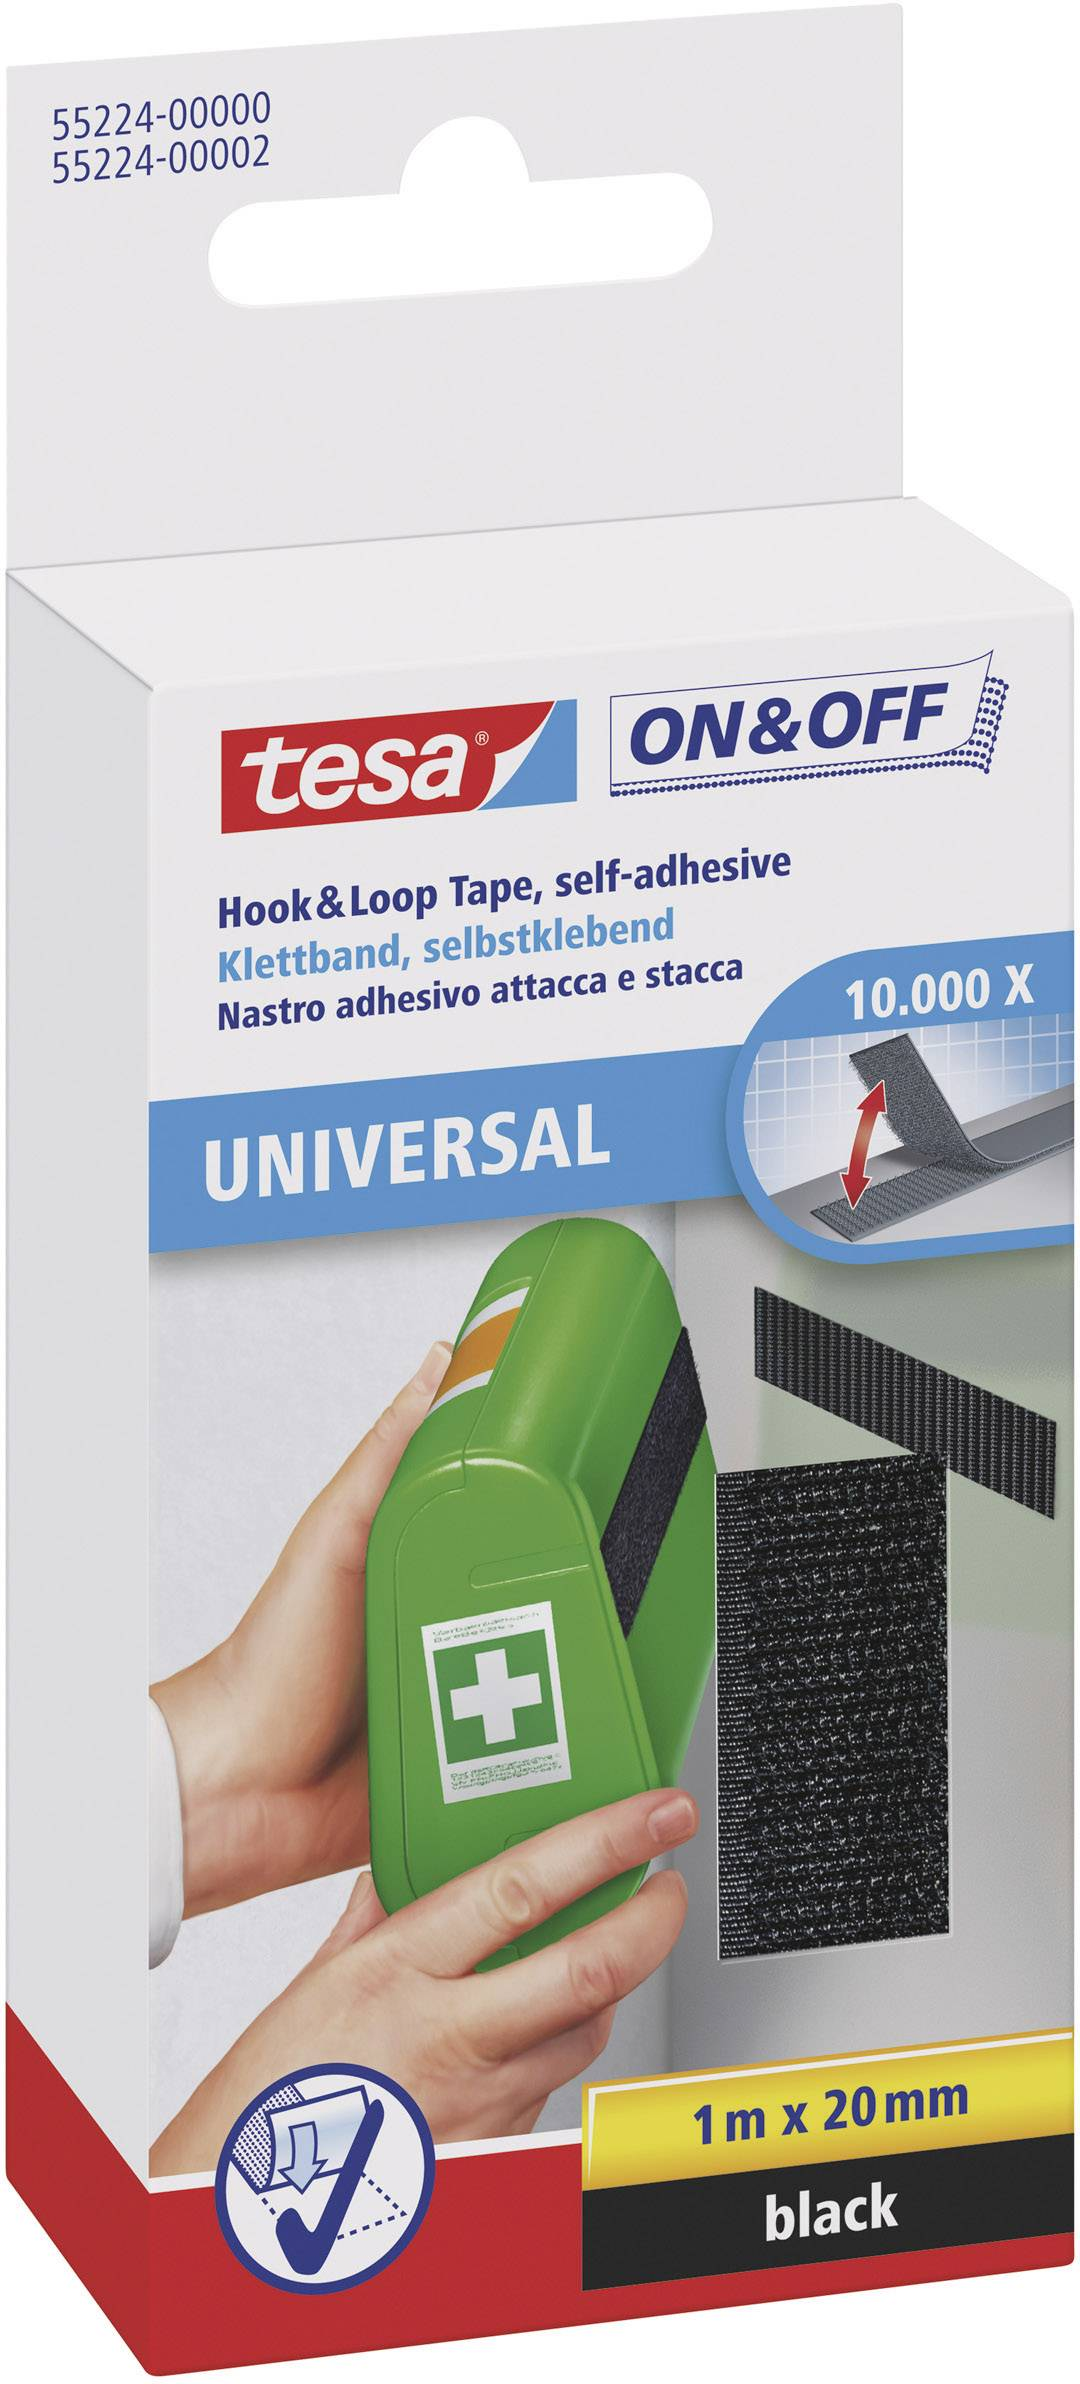 Lepiaci pásik so suchým zipsom TESA On & Off 55224-00-01, (d x š) 1000 mm x 20 mm, čierna, 1 ks